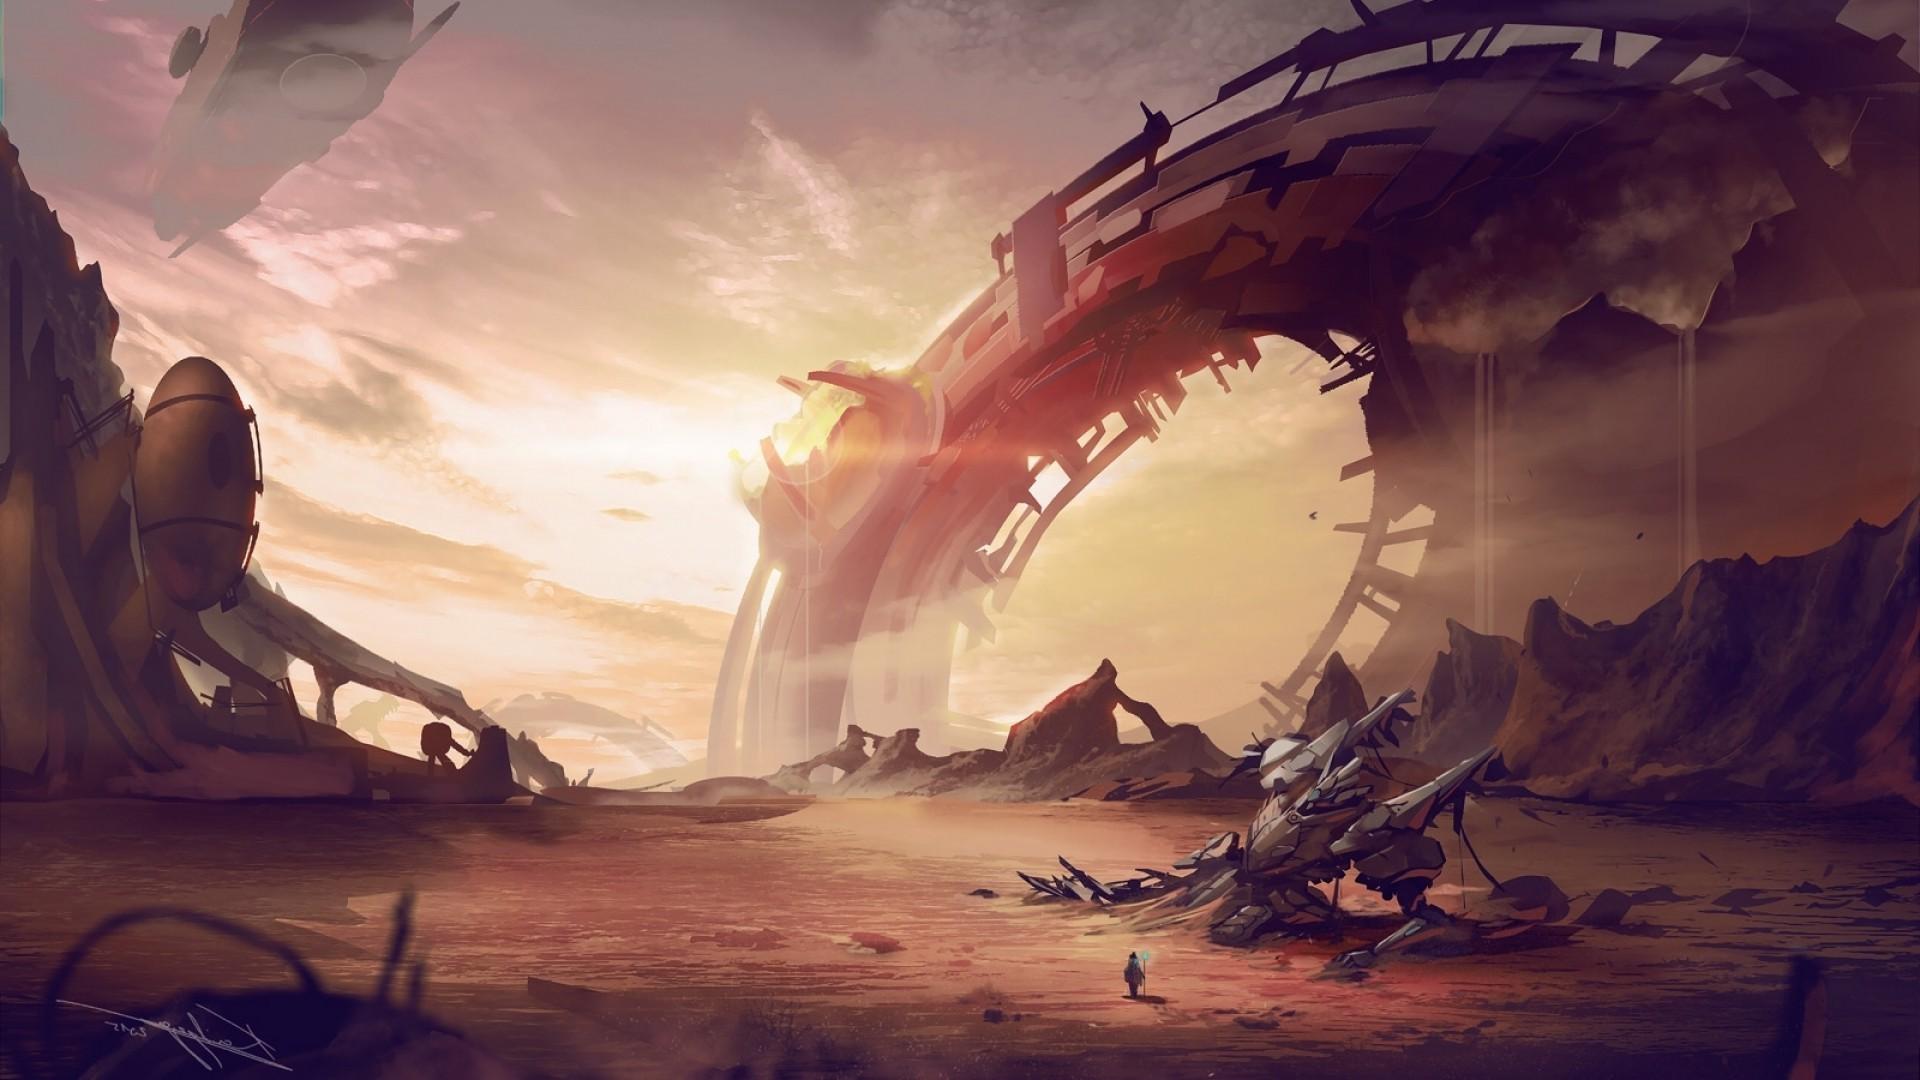 artwork, Fantasy Art, Space, Landscape, Futuristic, Aliens